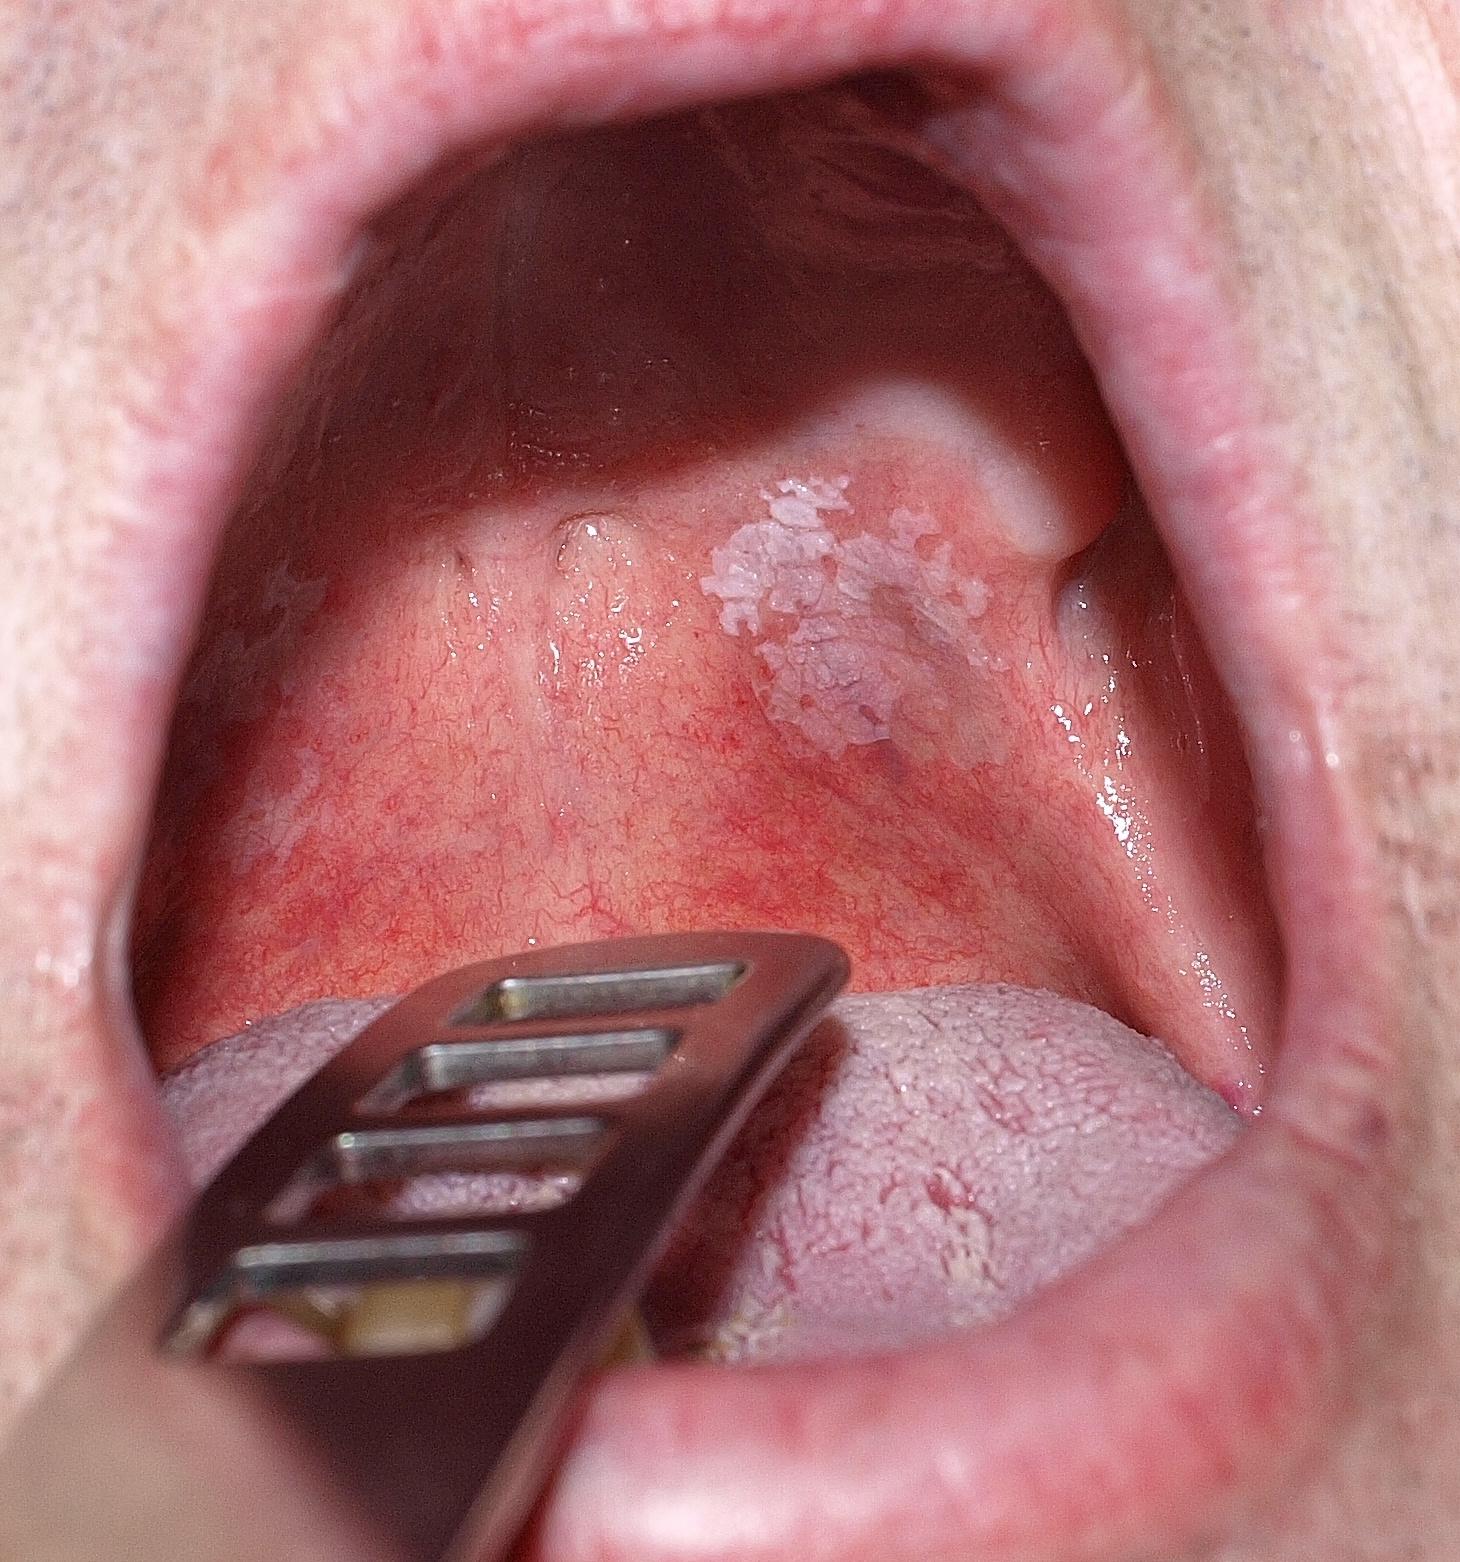 papilloma a nyelv hegyén)